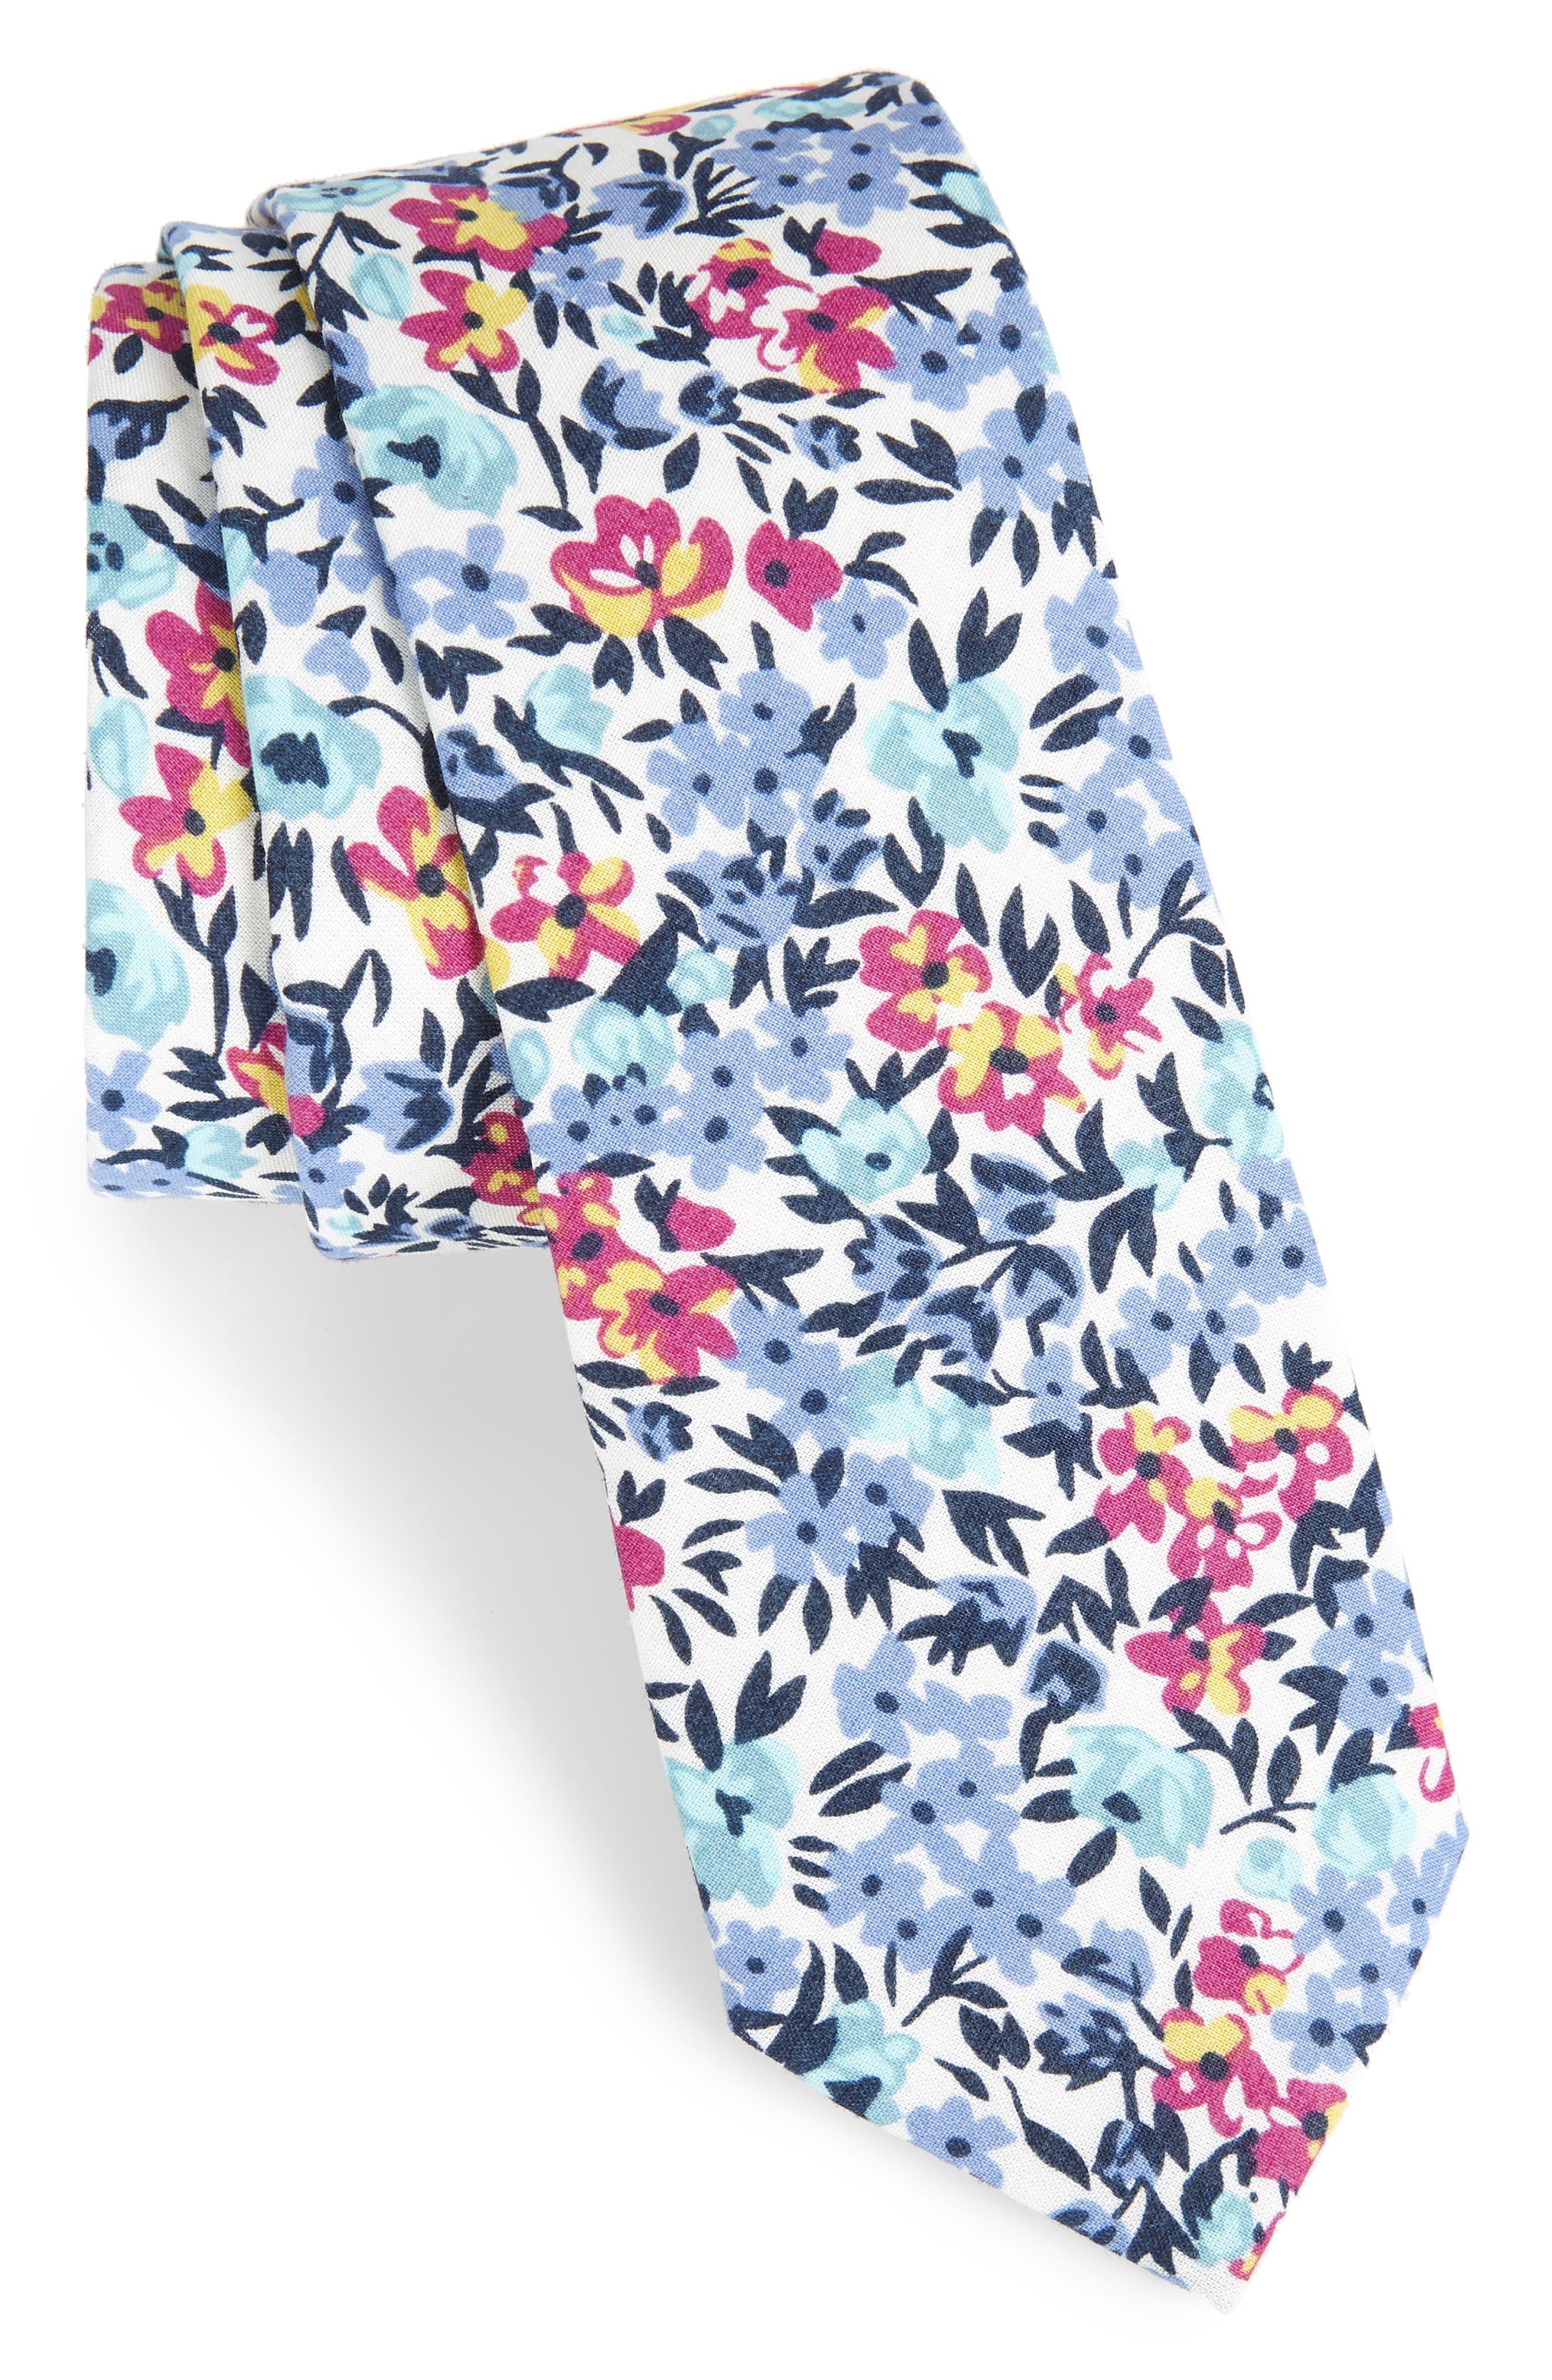 Anvil Floral Cotton Skinny Tie,                             Main thumbnail 1, color,                             400